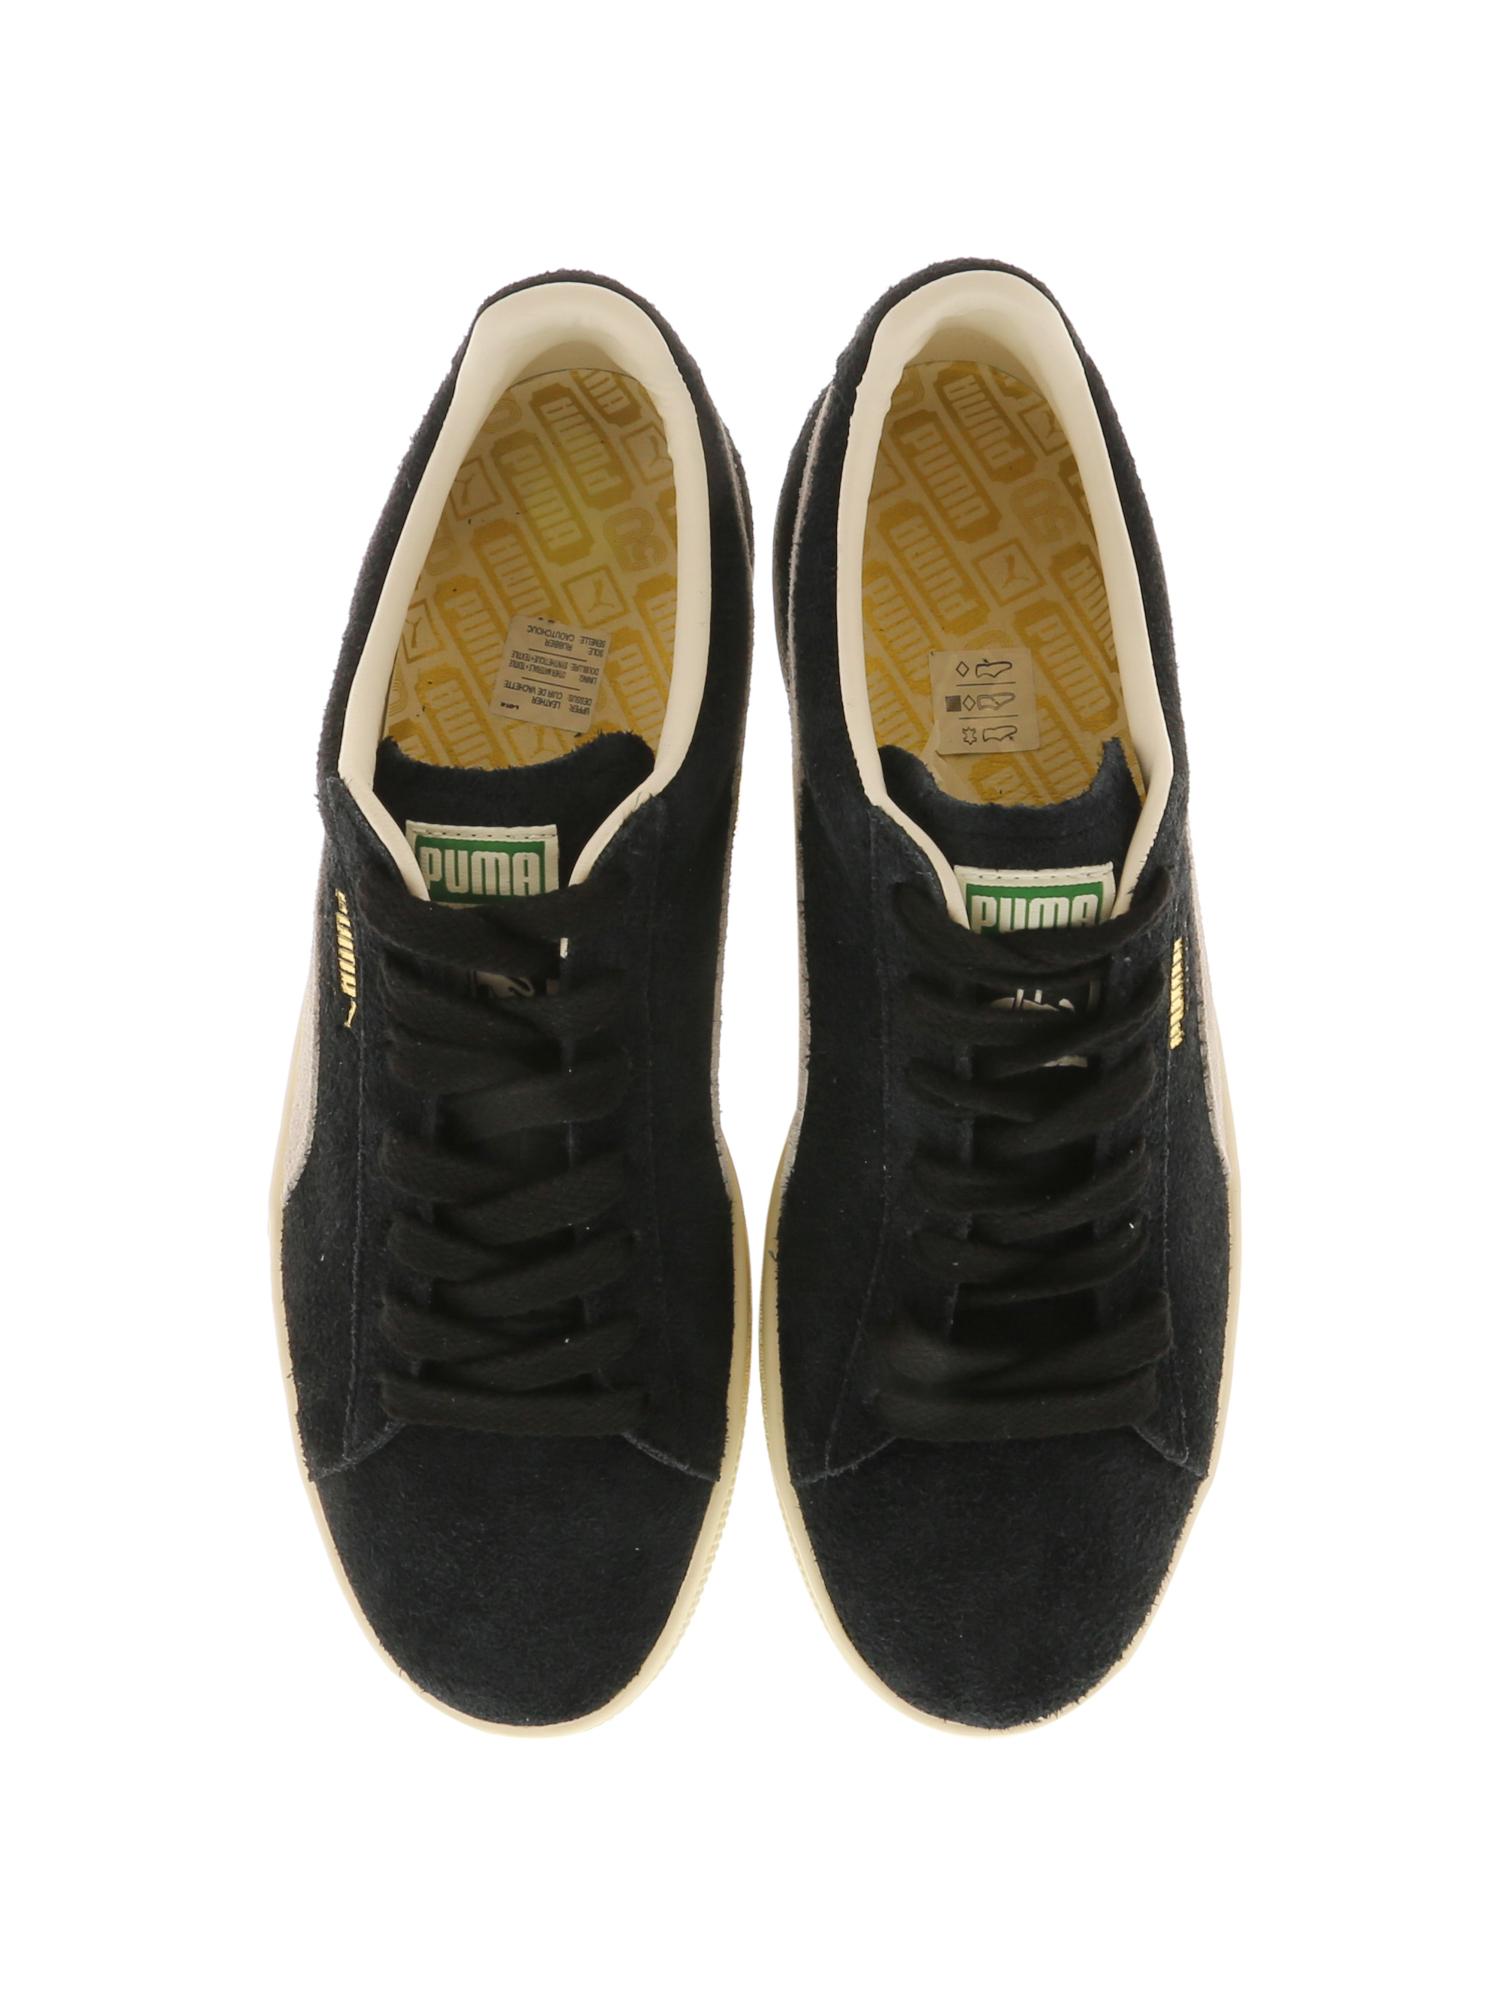 huge selection of 492f2 45ef3 Details about Puma Men's Suede Classic Rudolf Dassler Ankle-High Fashion  Sneaker